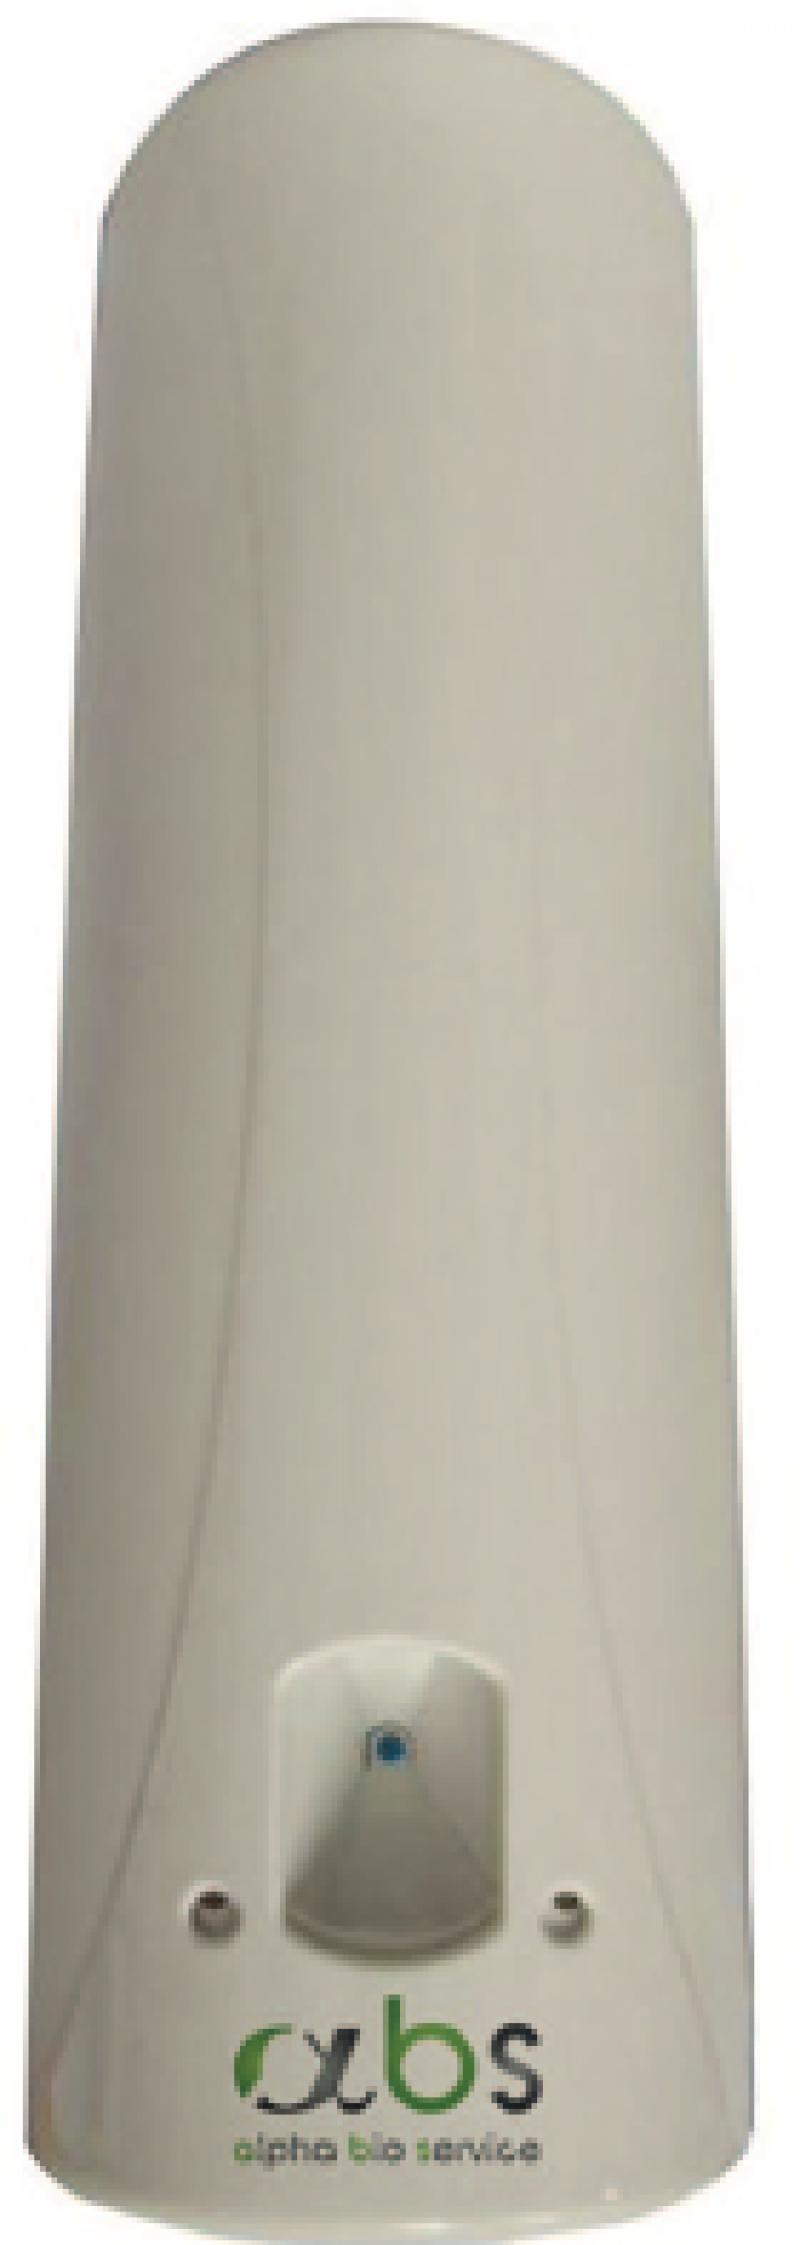 DIFFUSEUR ALPHABASIC 400S